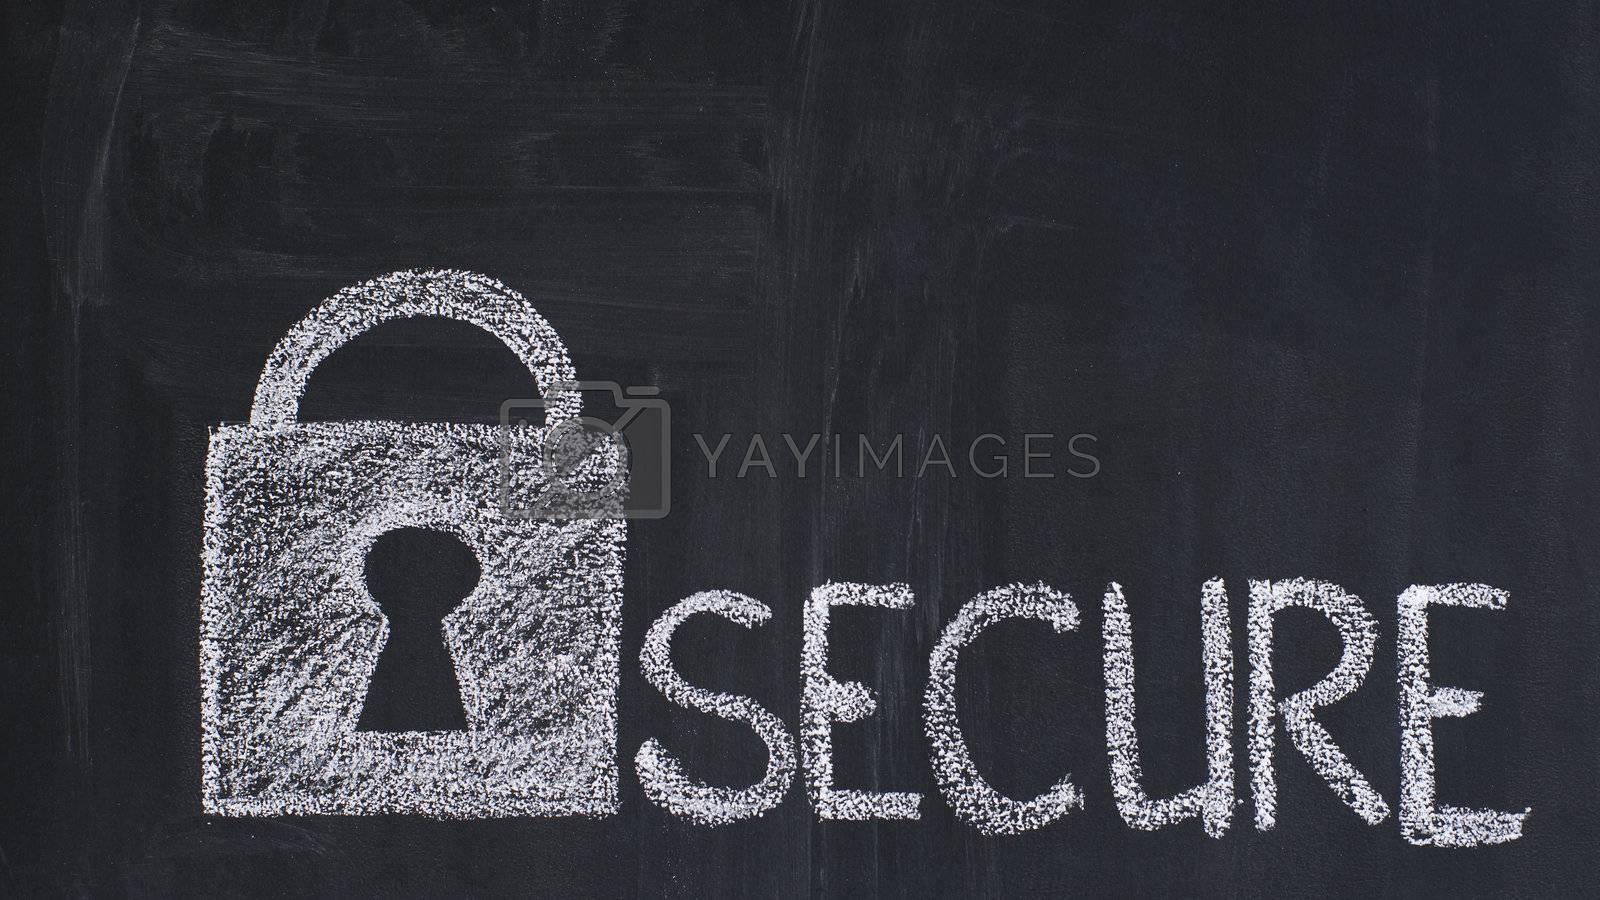 Secure padlock drawn by a chalk on a blackboard